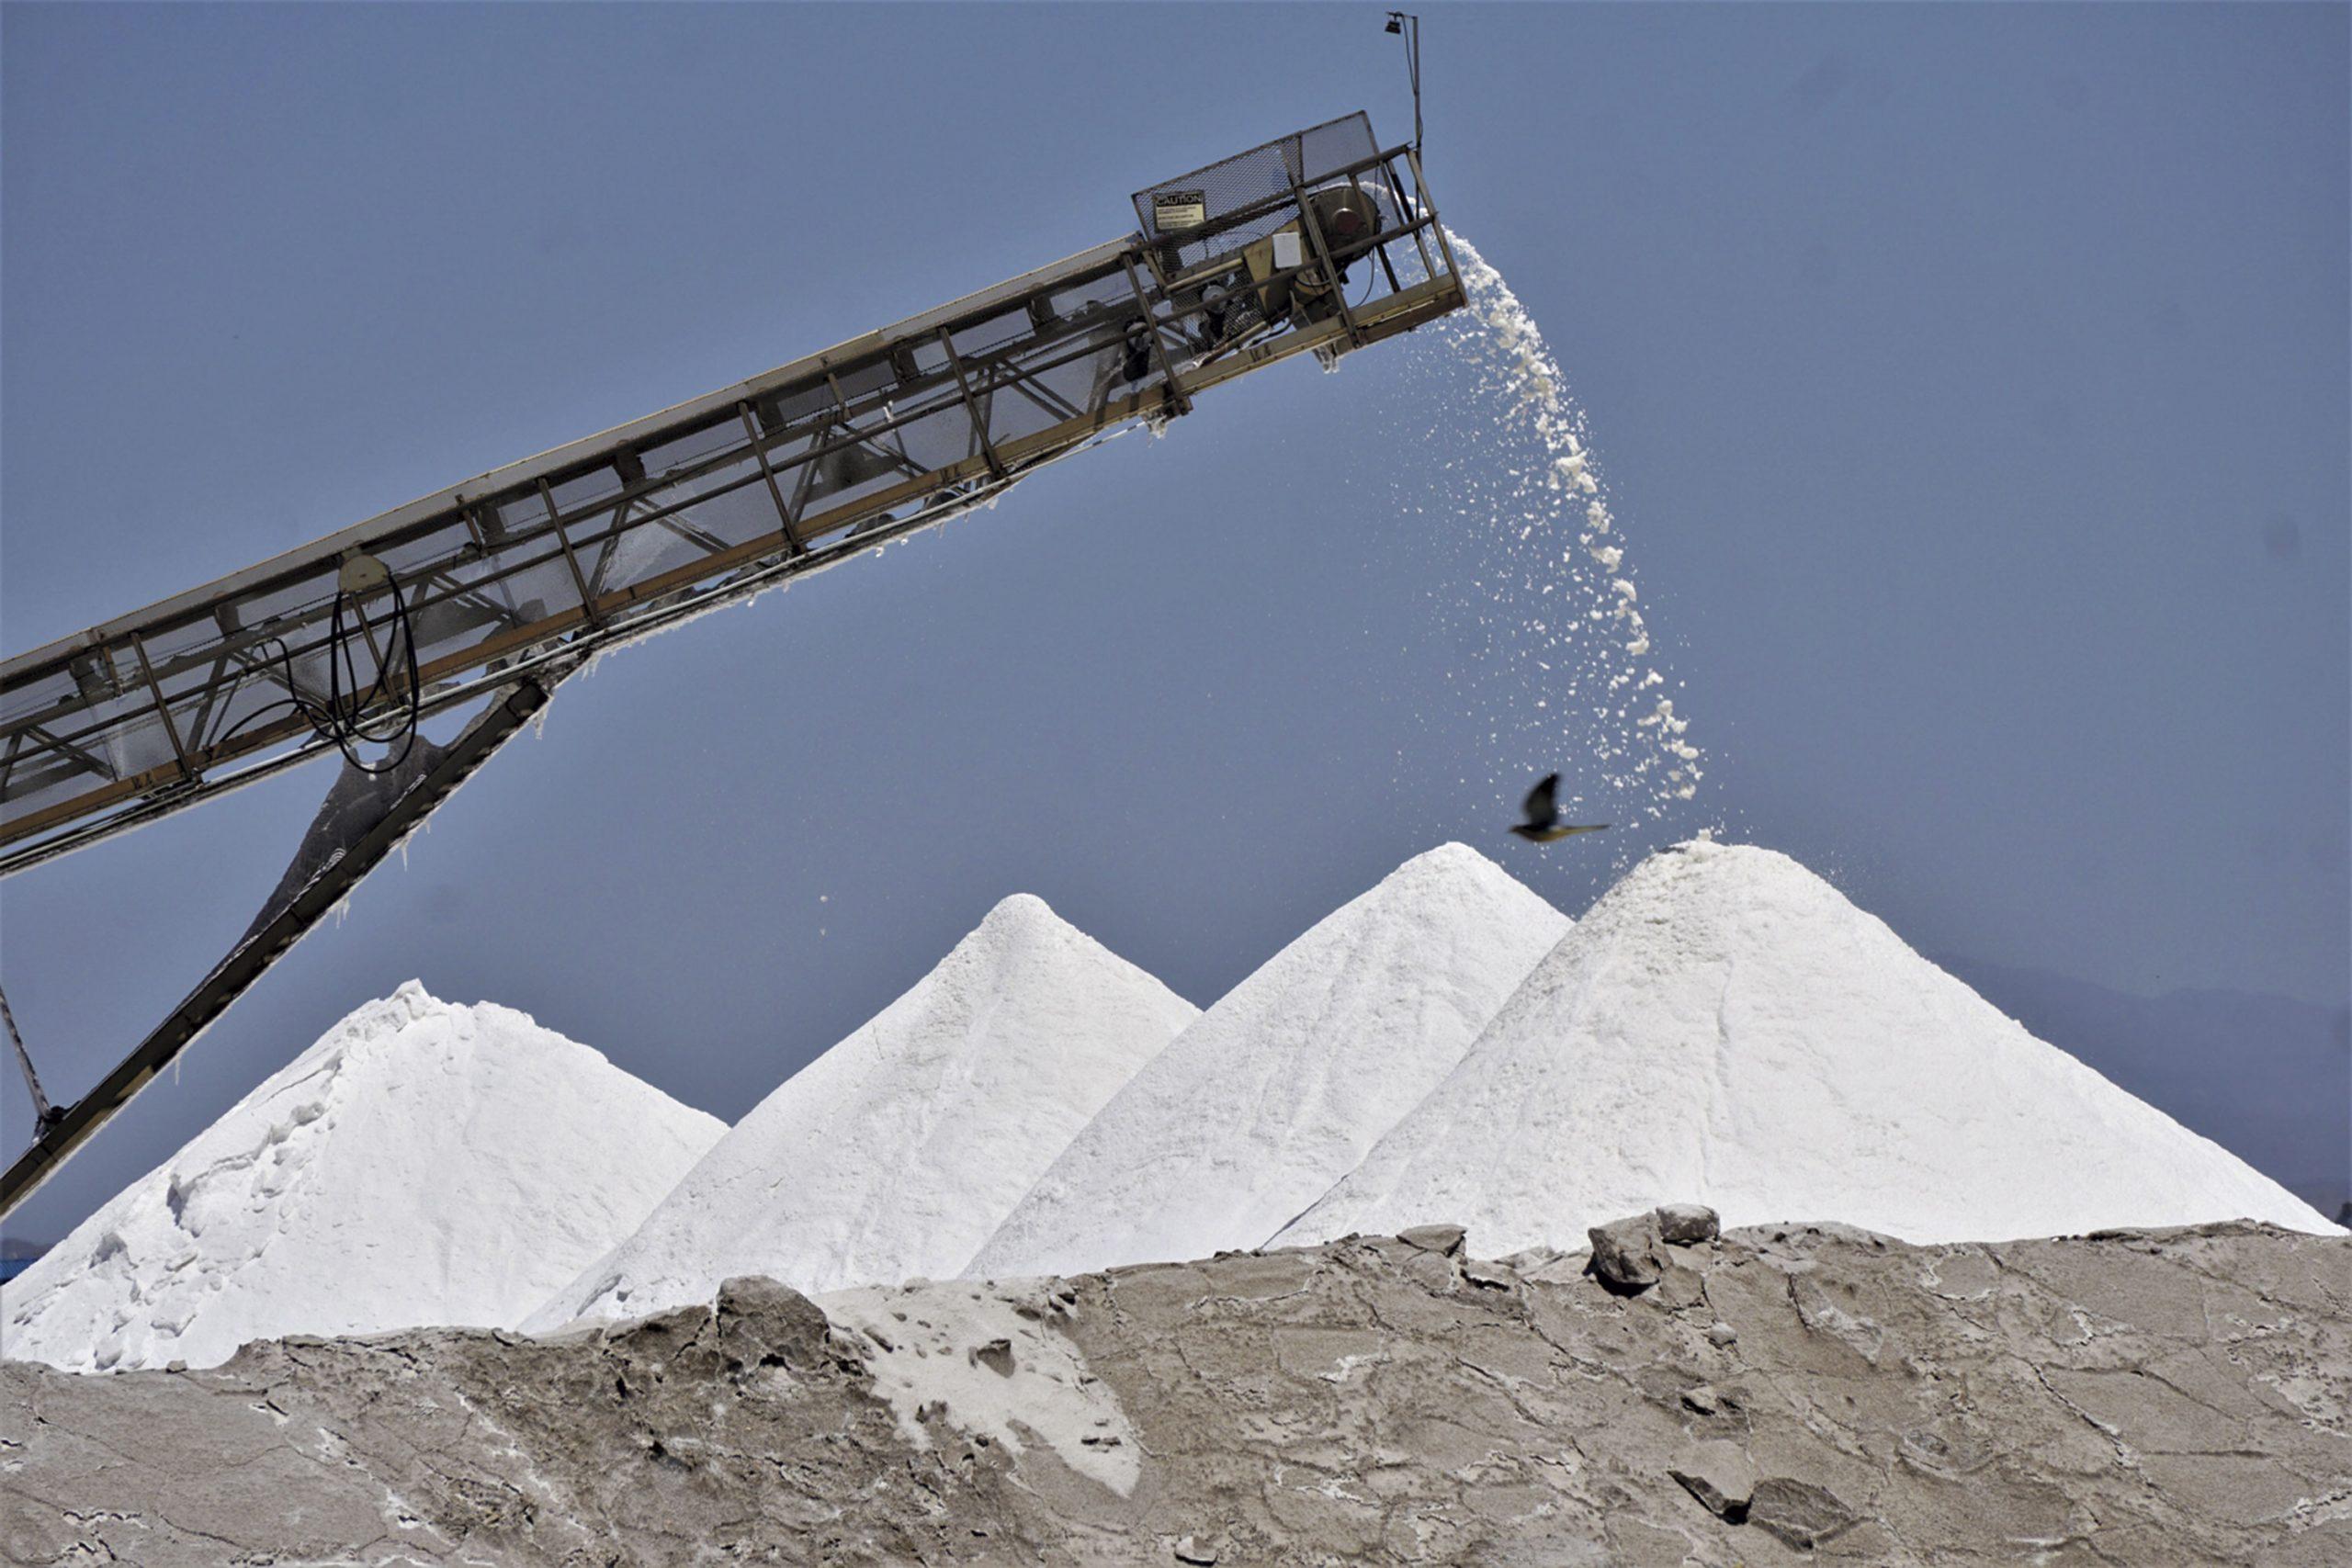 salt harvest, 2021; Photo courtesy Douglas C. Towne